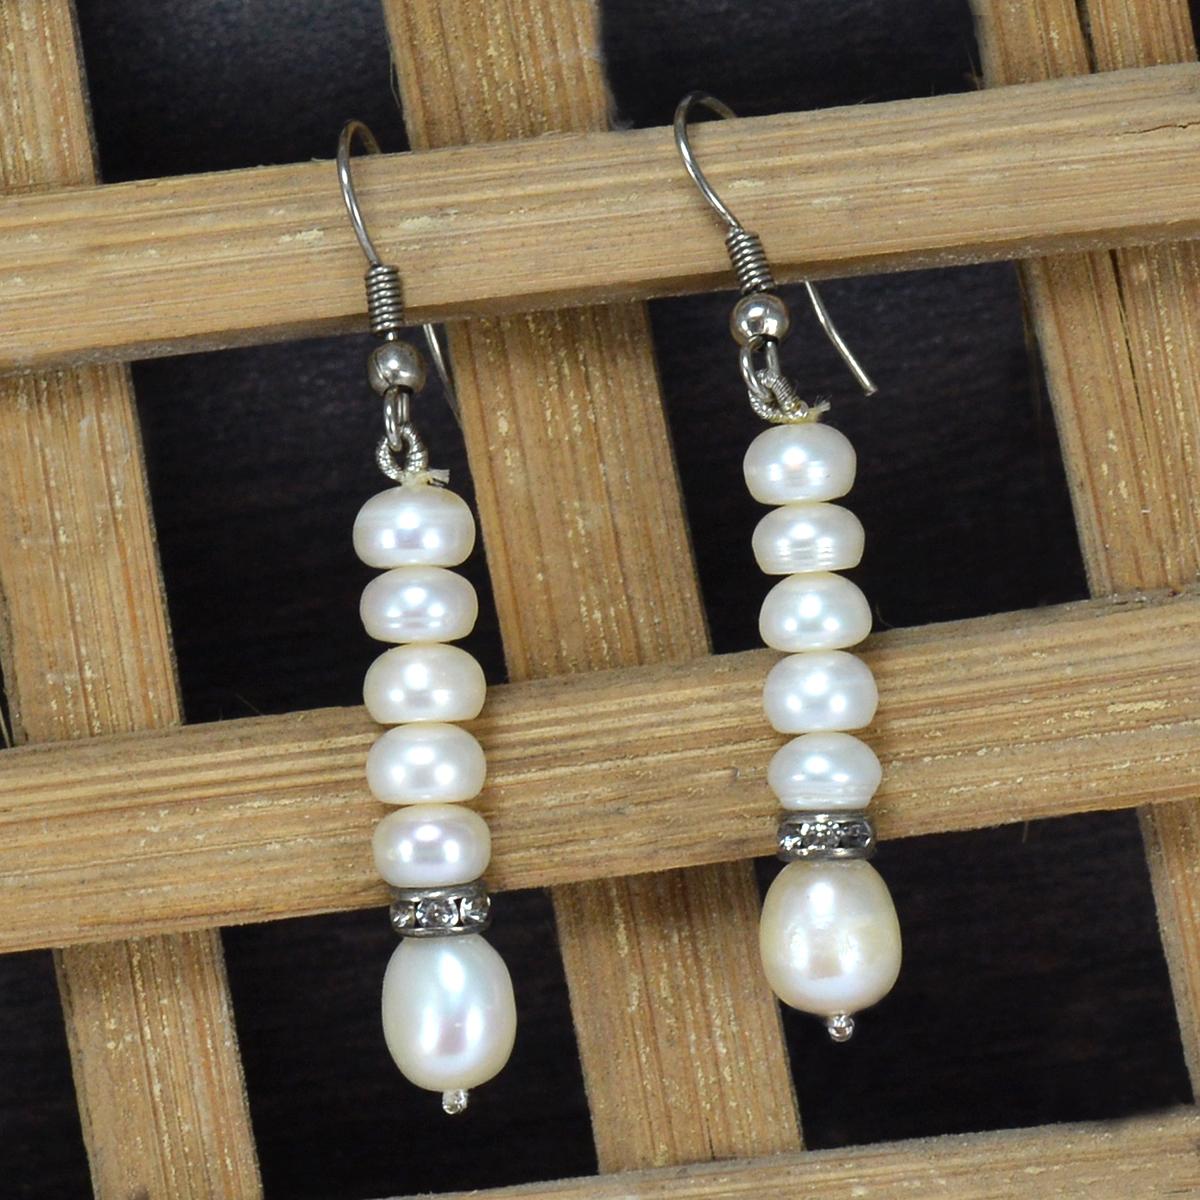 Handmade Jewelry Manufacturer Beaded Pearl Fish Hook Designer Earring, 925 Sterling Silver, Silver Tone Earring Jaipur Rajasthan India